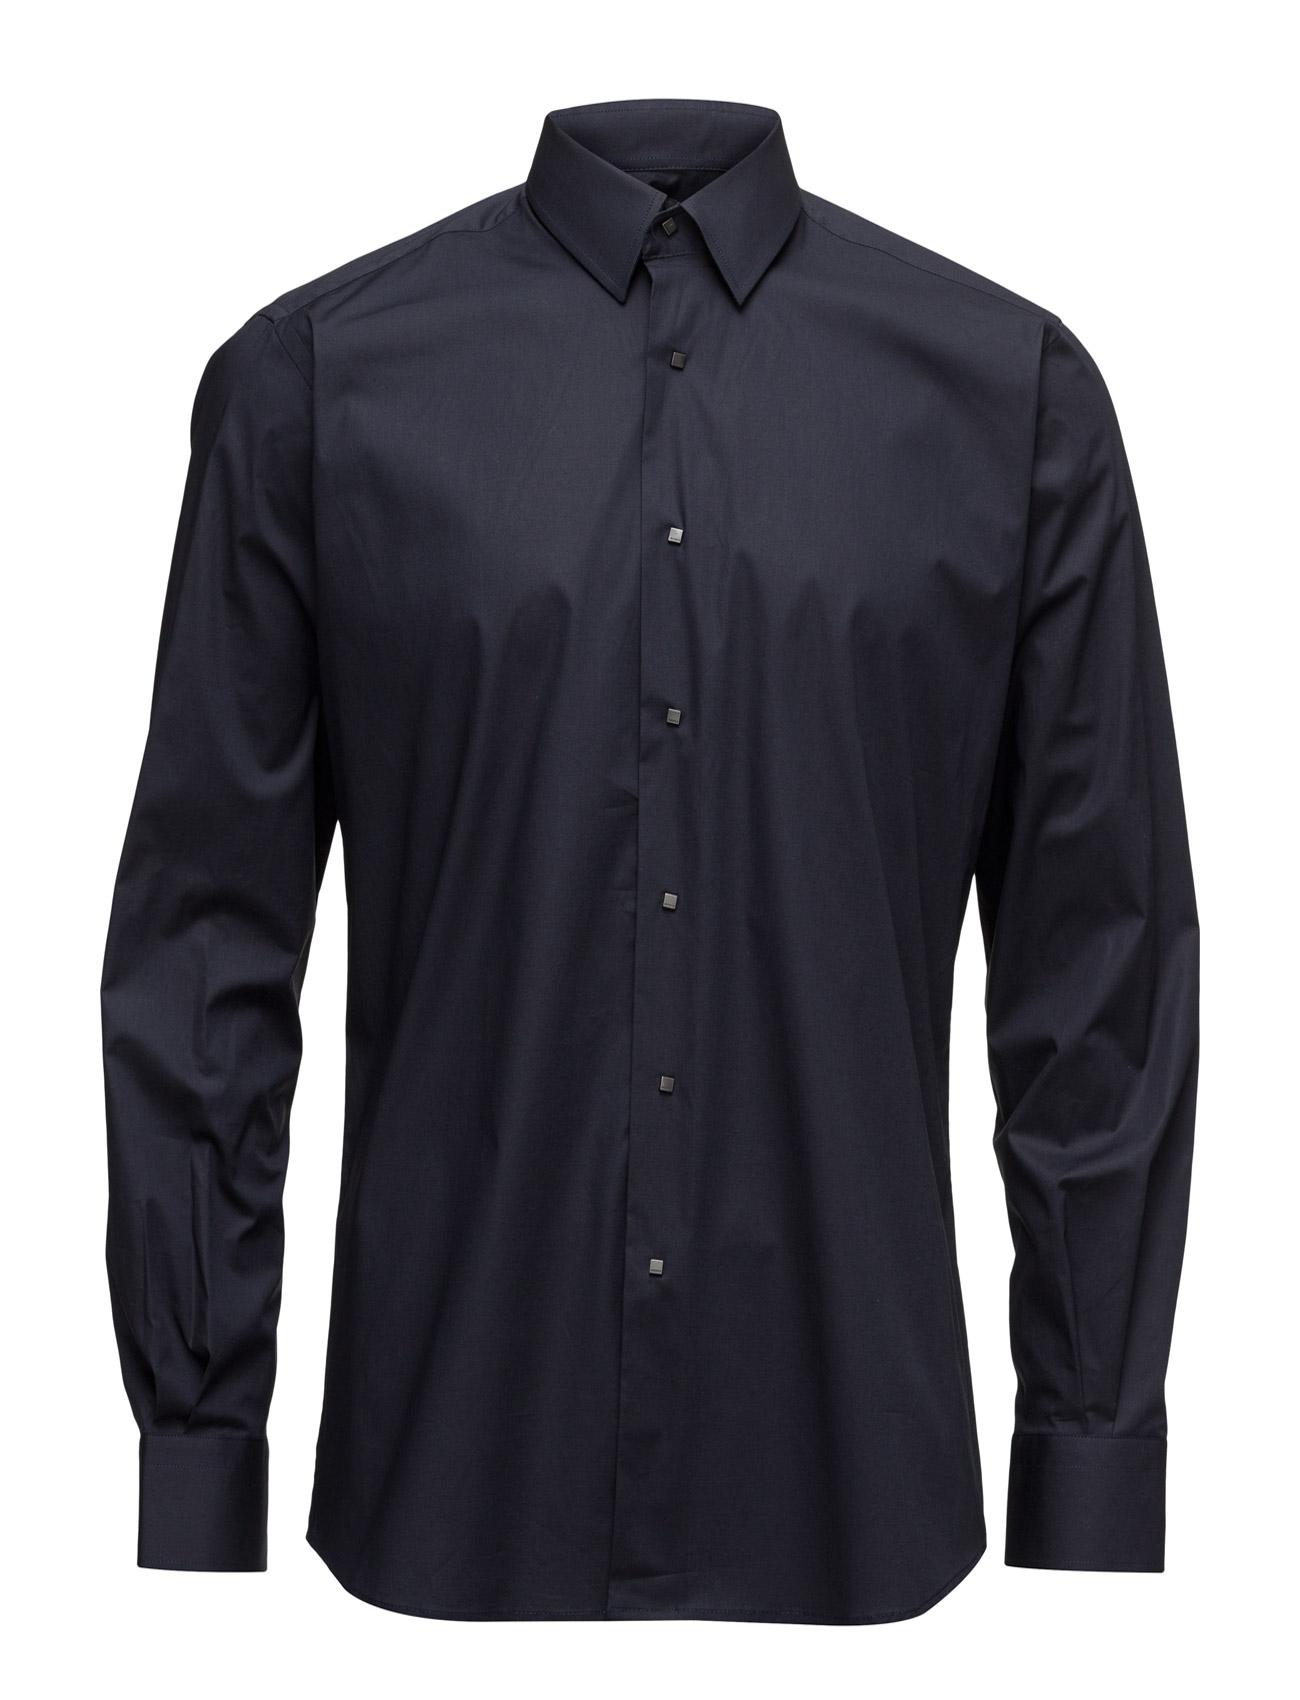 lagerfeld – Shirt slim på boozt.com dk